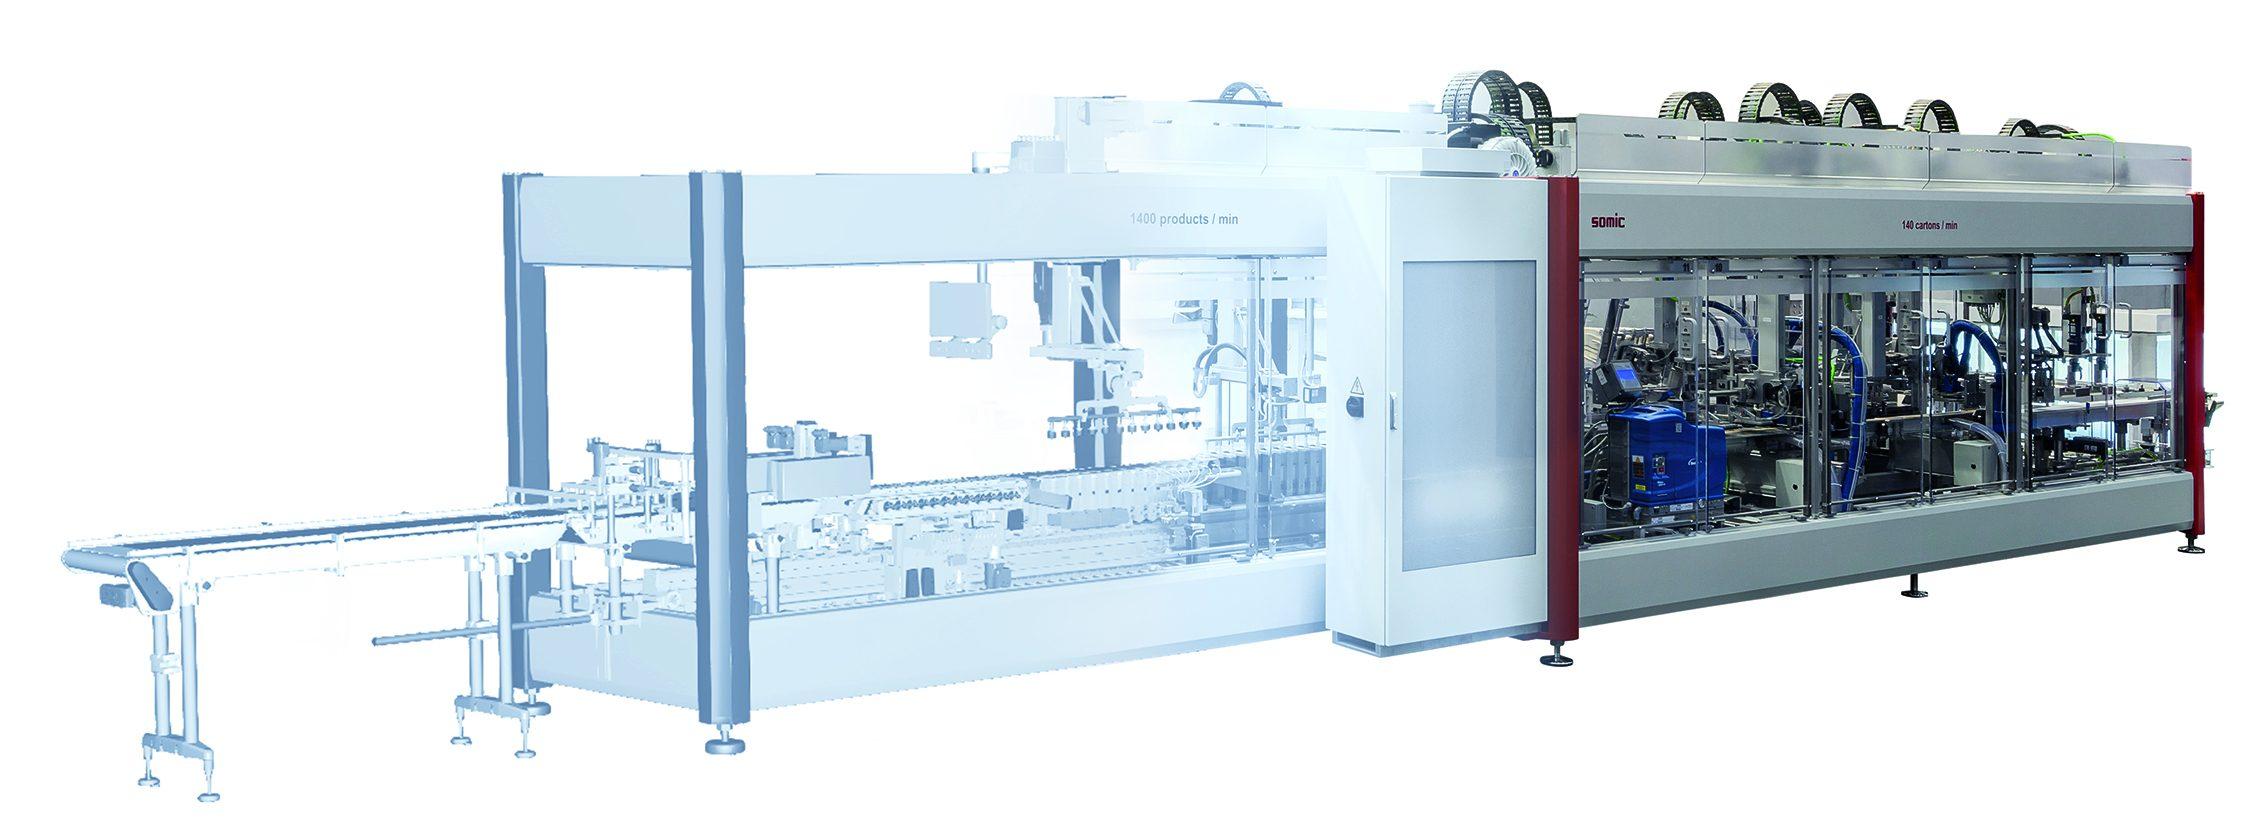 (Bild: Somic Verpackungsmaschinen GmbH & Co. KG / Machineering GmbH & Co. KG)